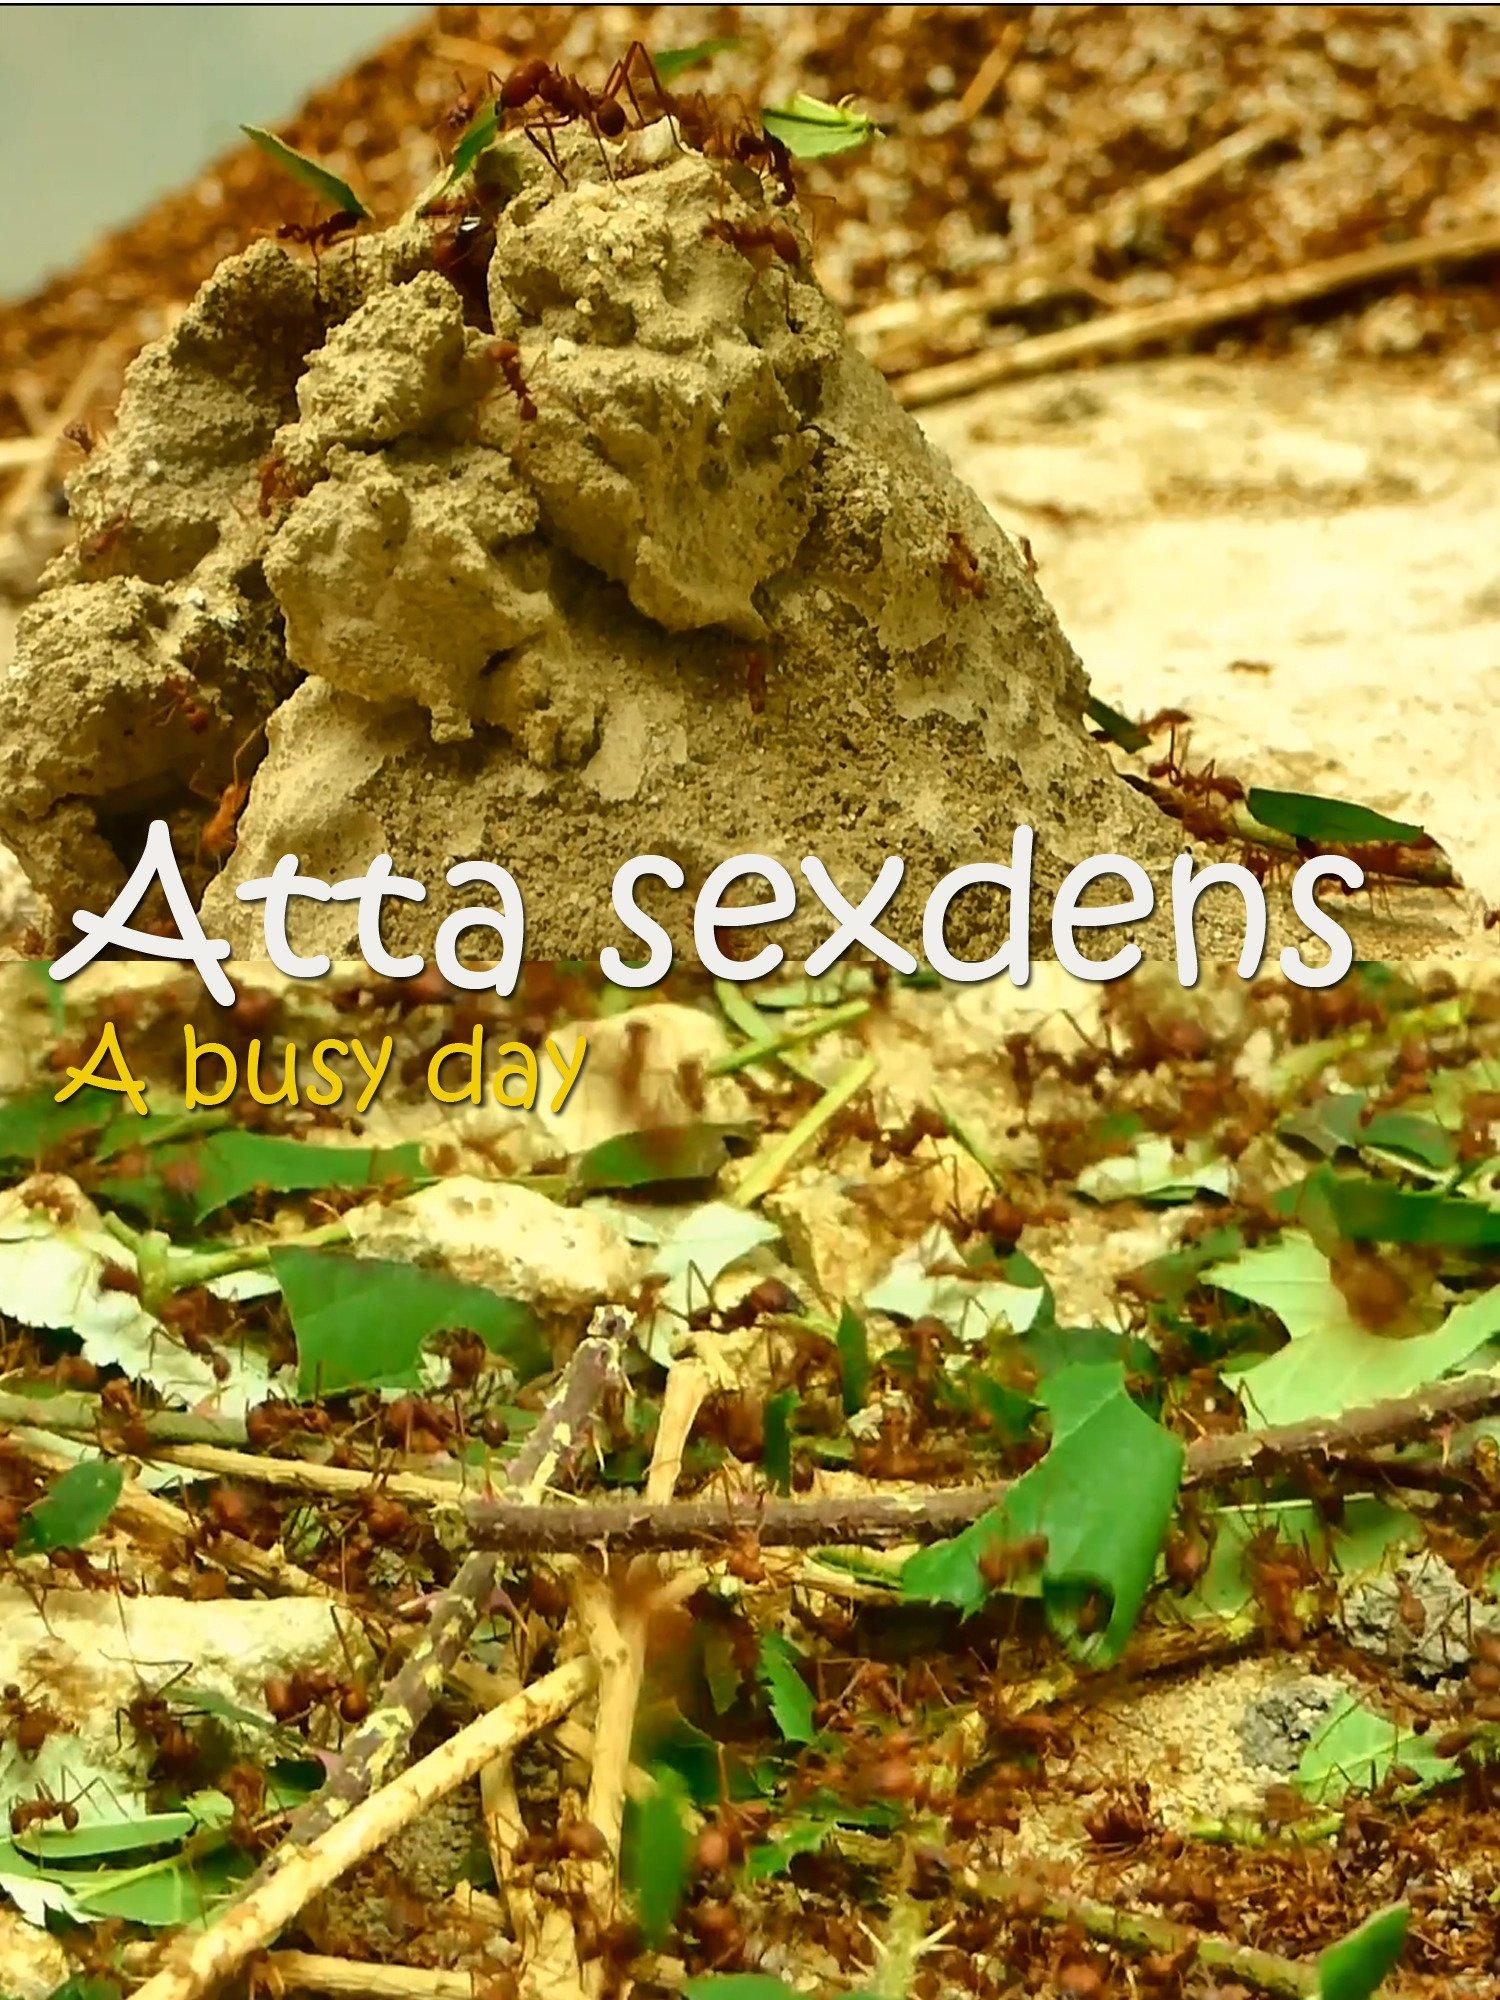 Atta sexdens. A busy day